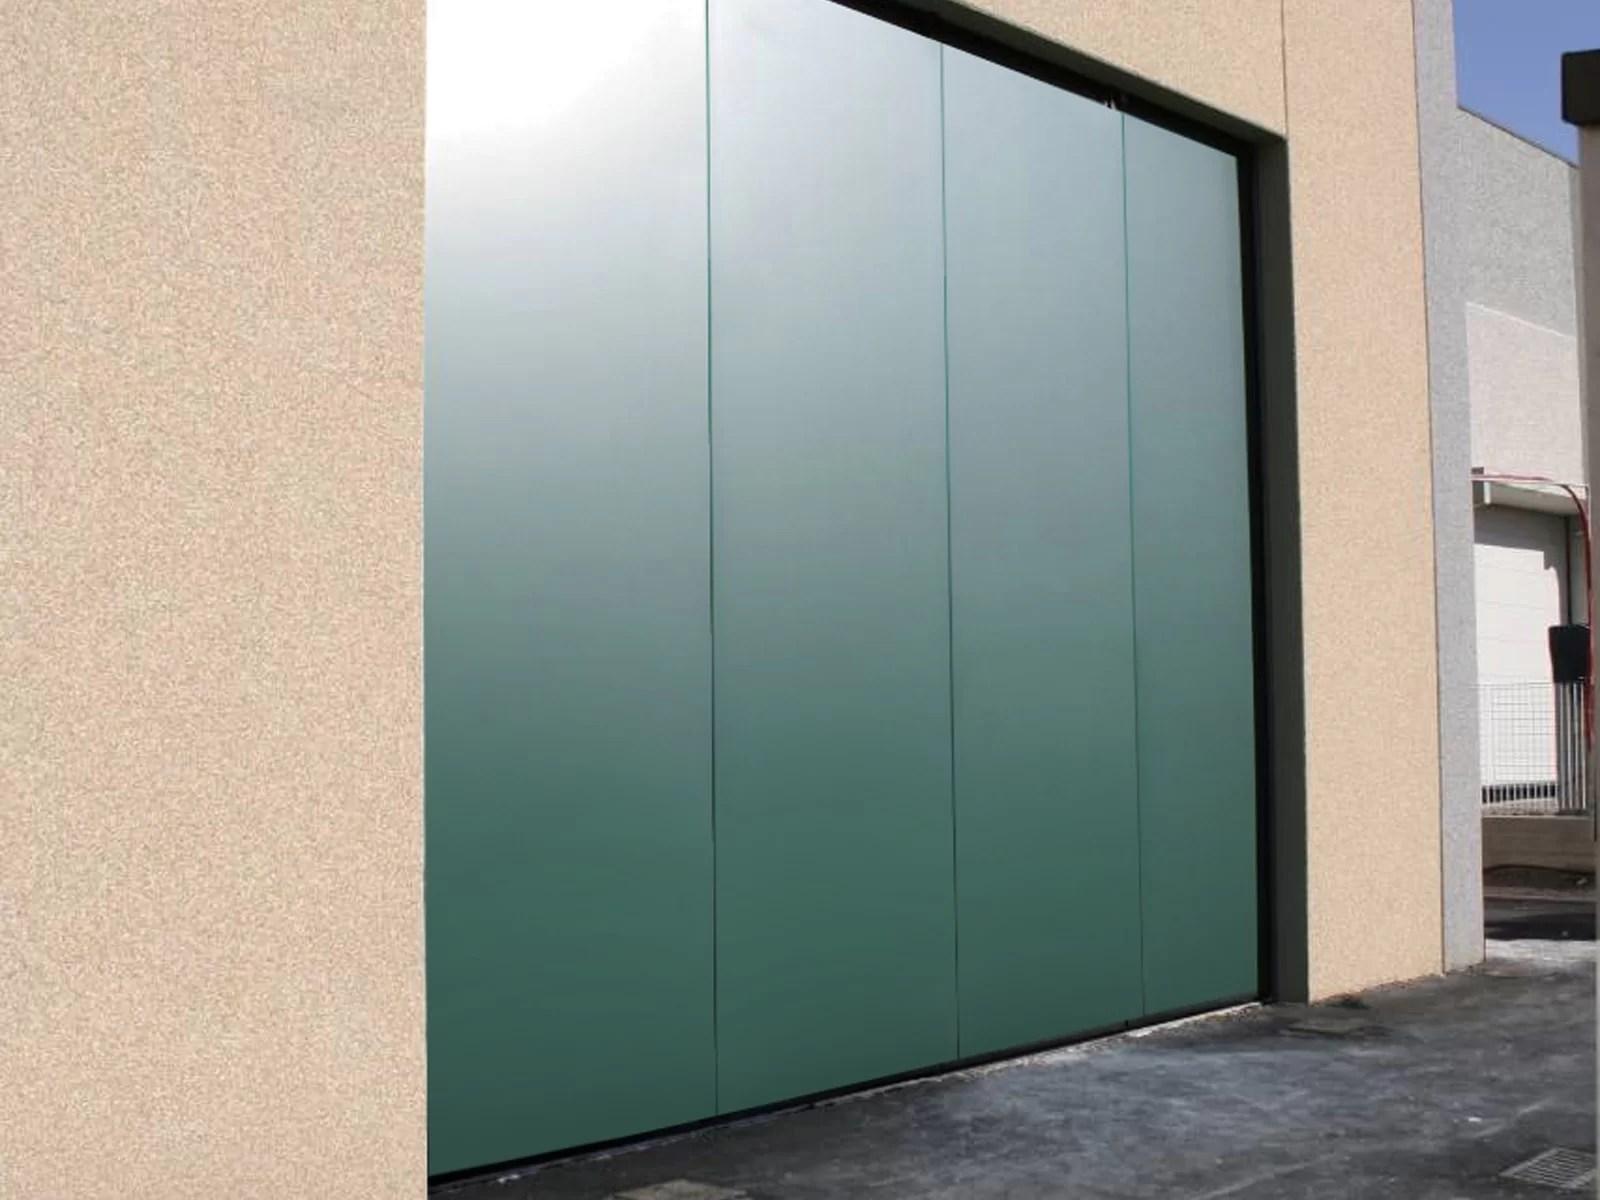 Portone scorrevole industriale ATLANTE - Verde RAL 6005